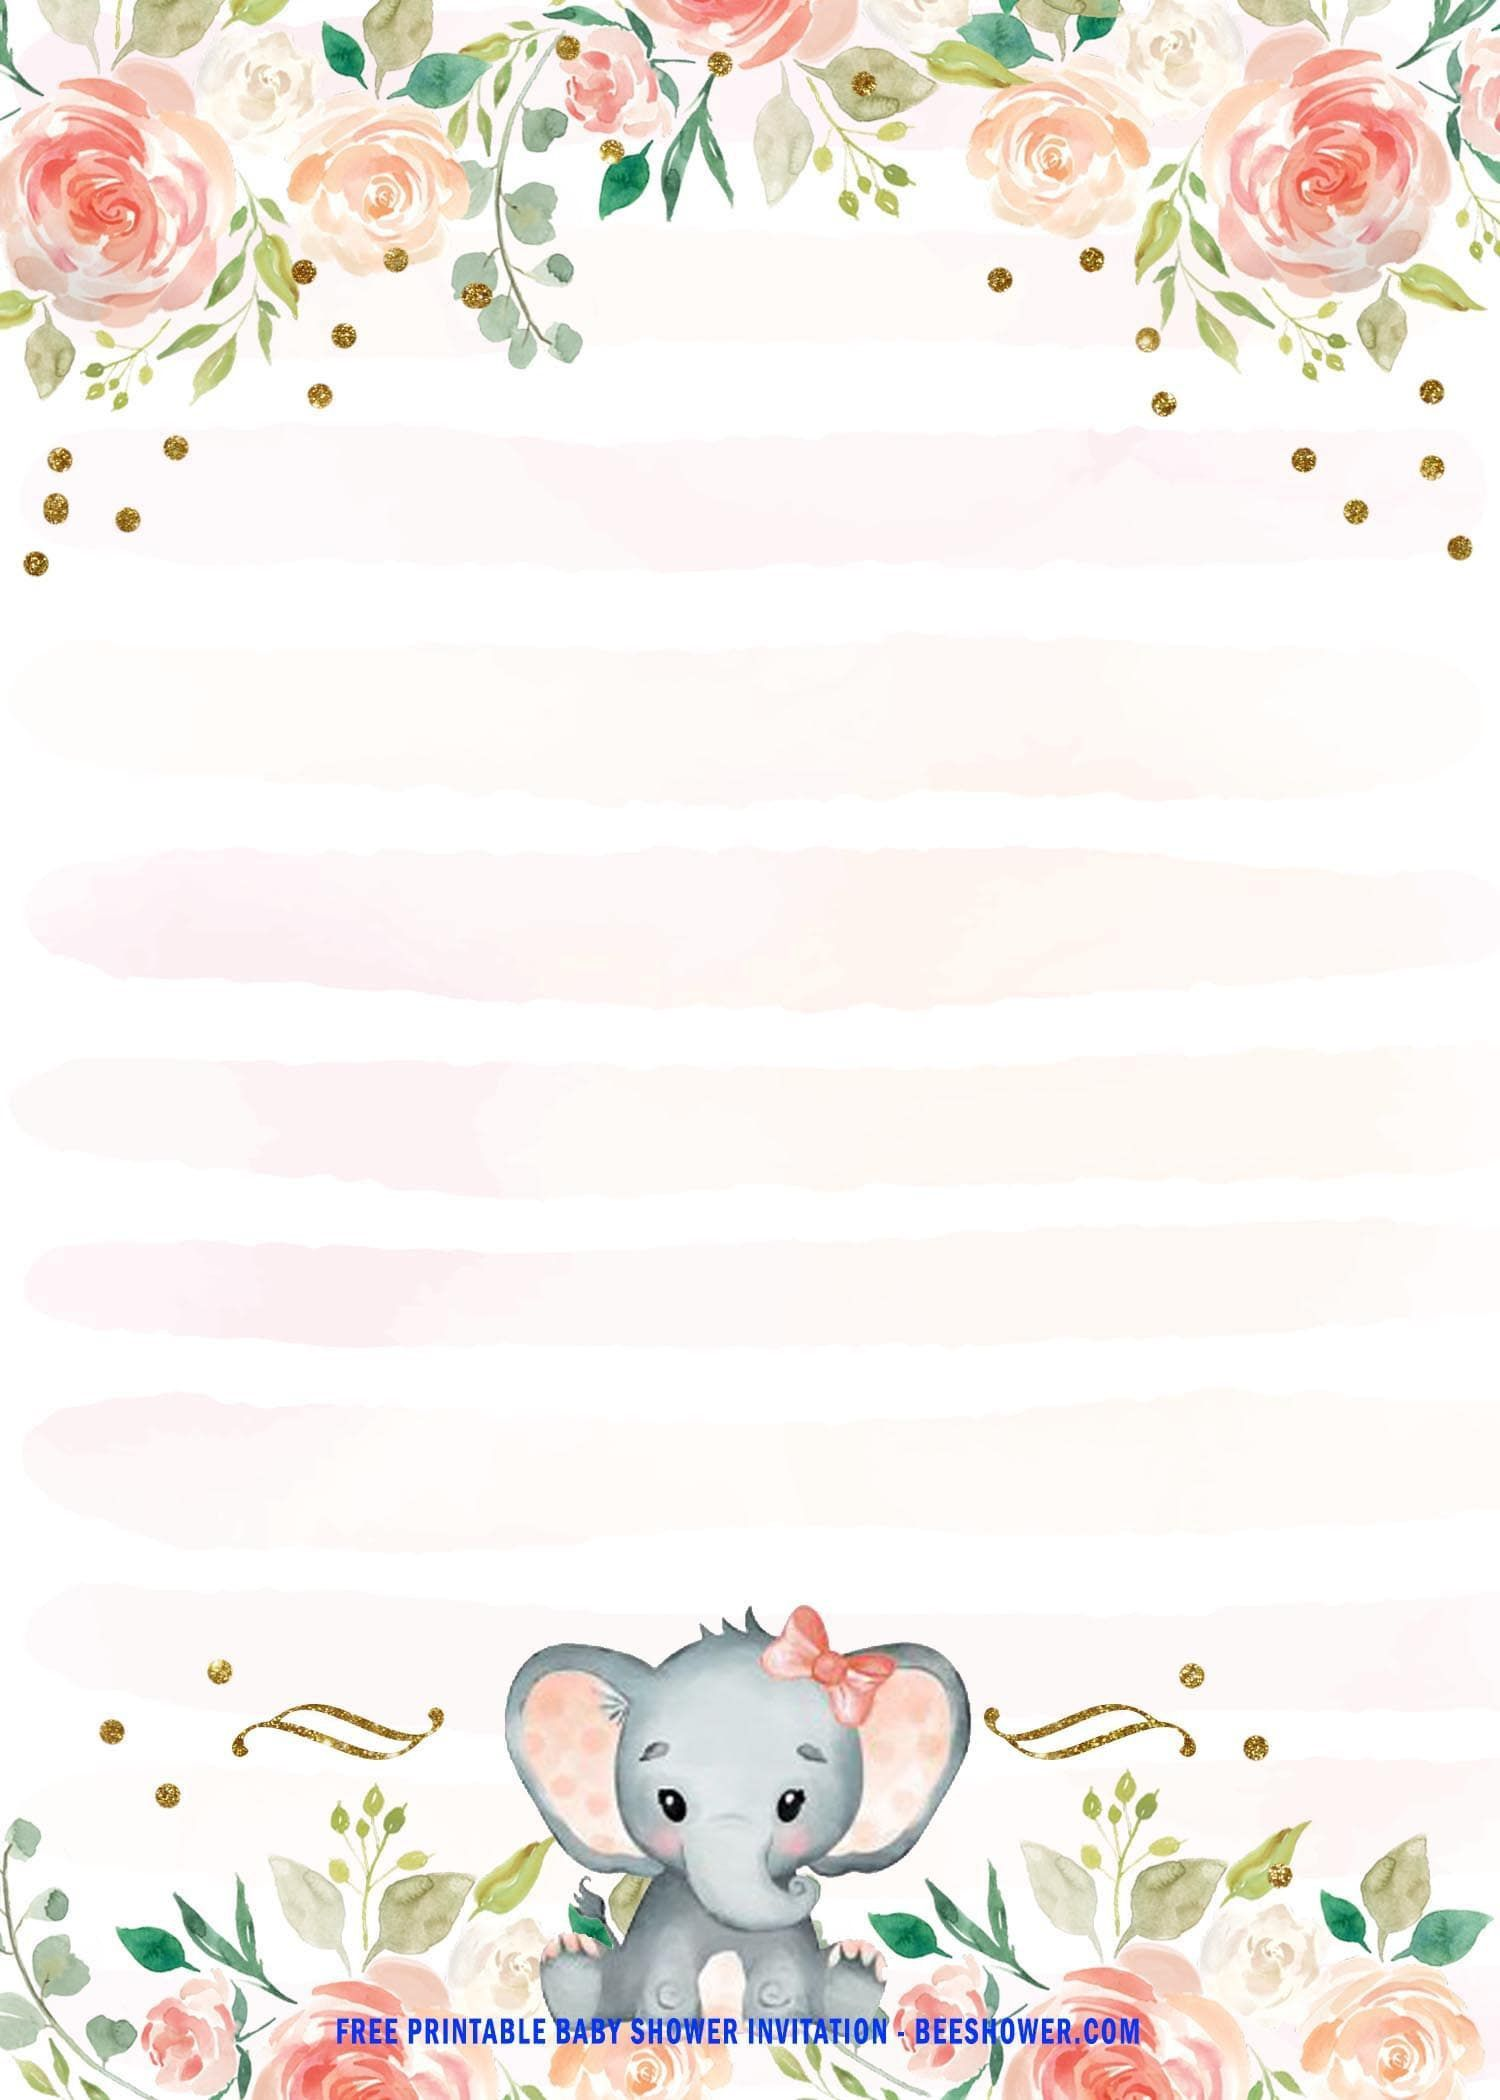 002 Wonderful Free Baby Shower Printable Elephant High Definition  DecorationFull